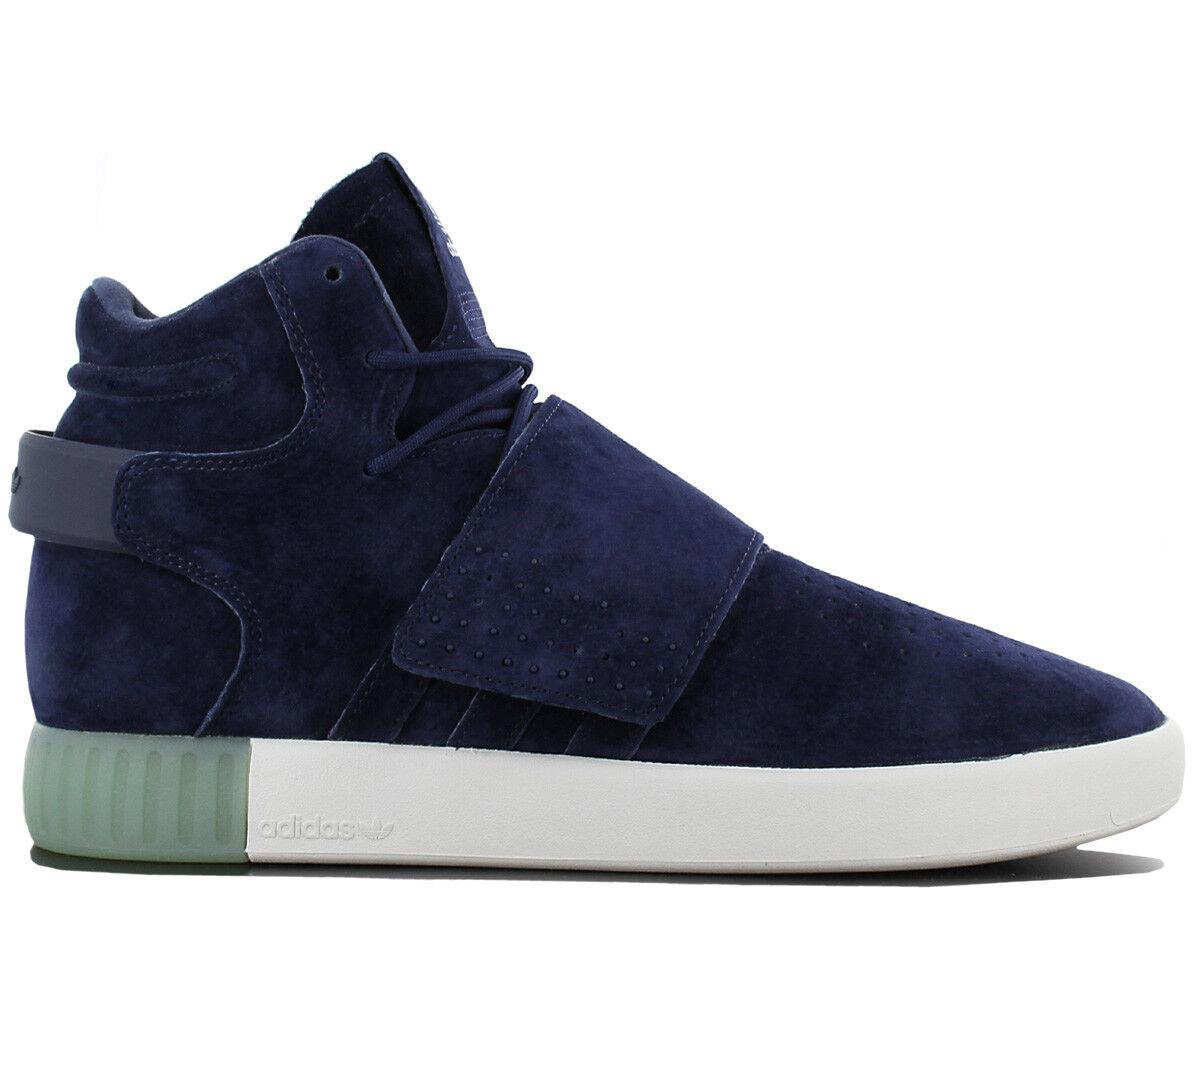 adidas Originals Tubular Schuhe Invader Strap Leder Blau Herren Schuhe Tubular Sneaker BB5041 186bab